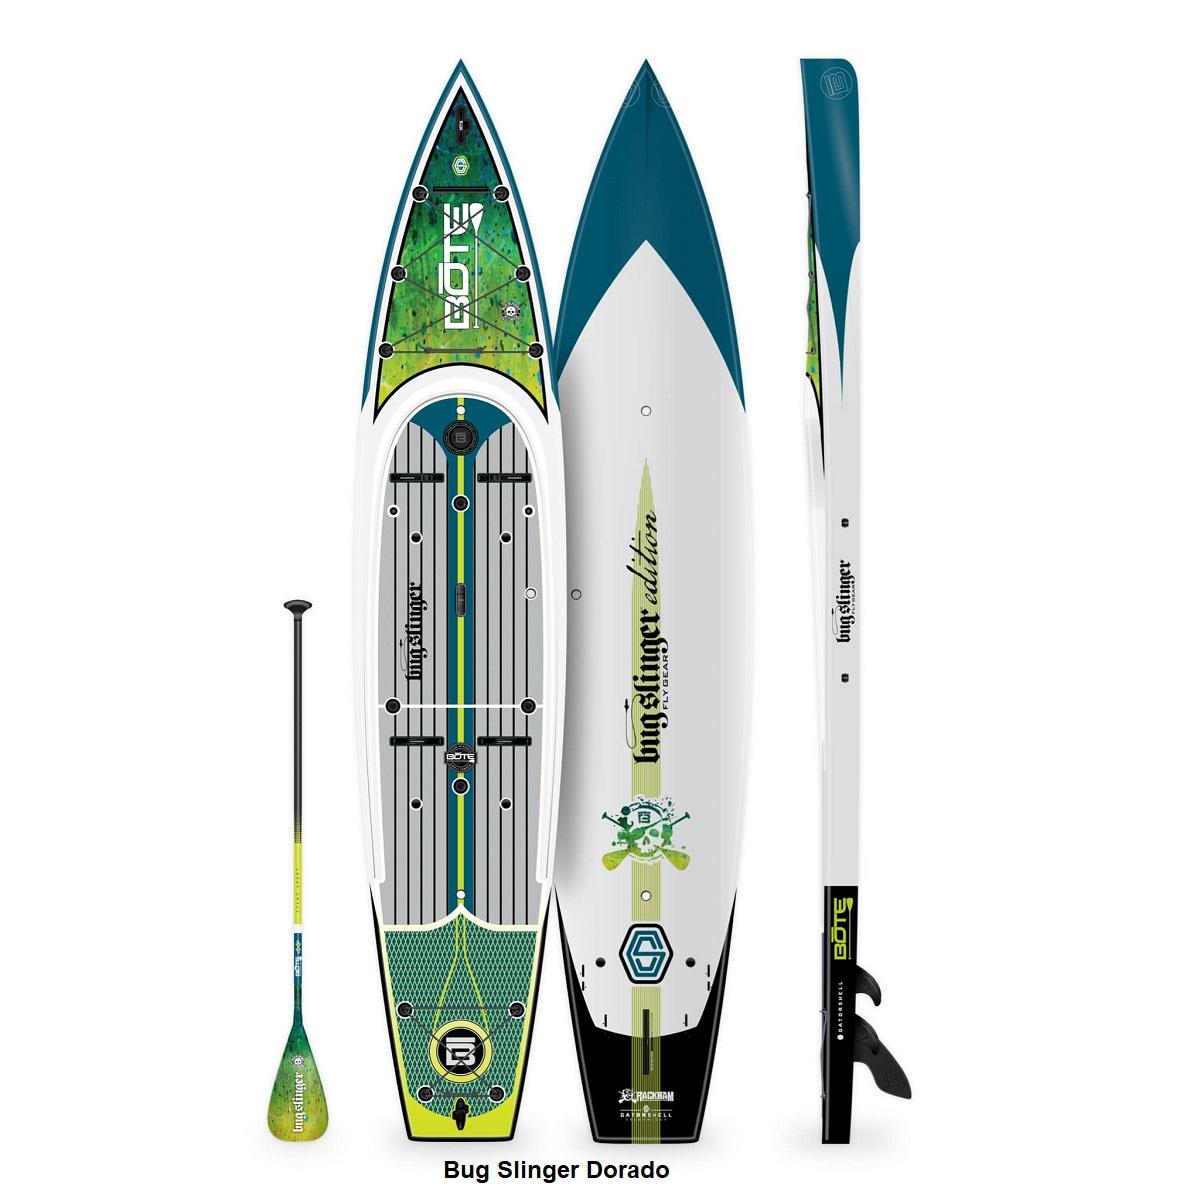 BOTE Rackham 14' Paddle Board - Bug Slinger Dorado